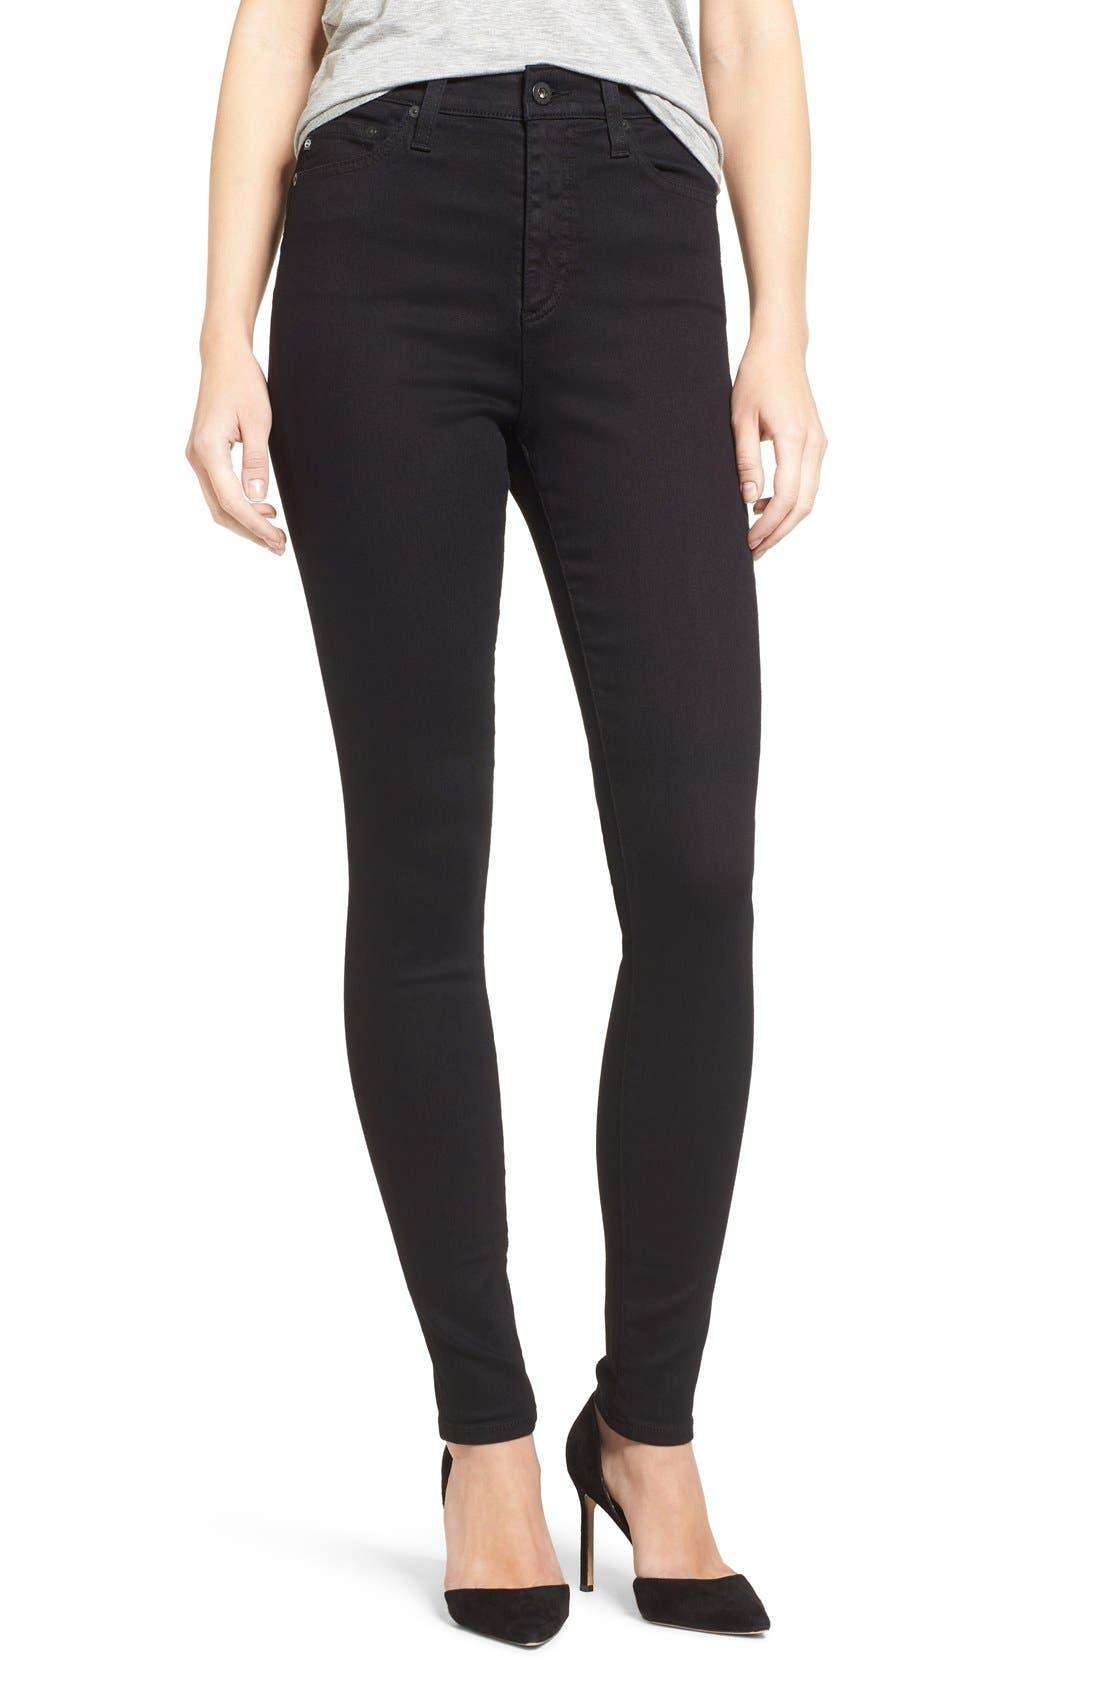 Mila High Rise Skinny Jeans,                         Main,                         color, Over Dye Black